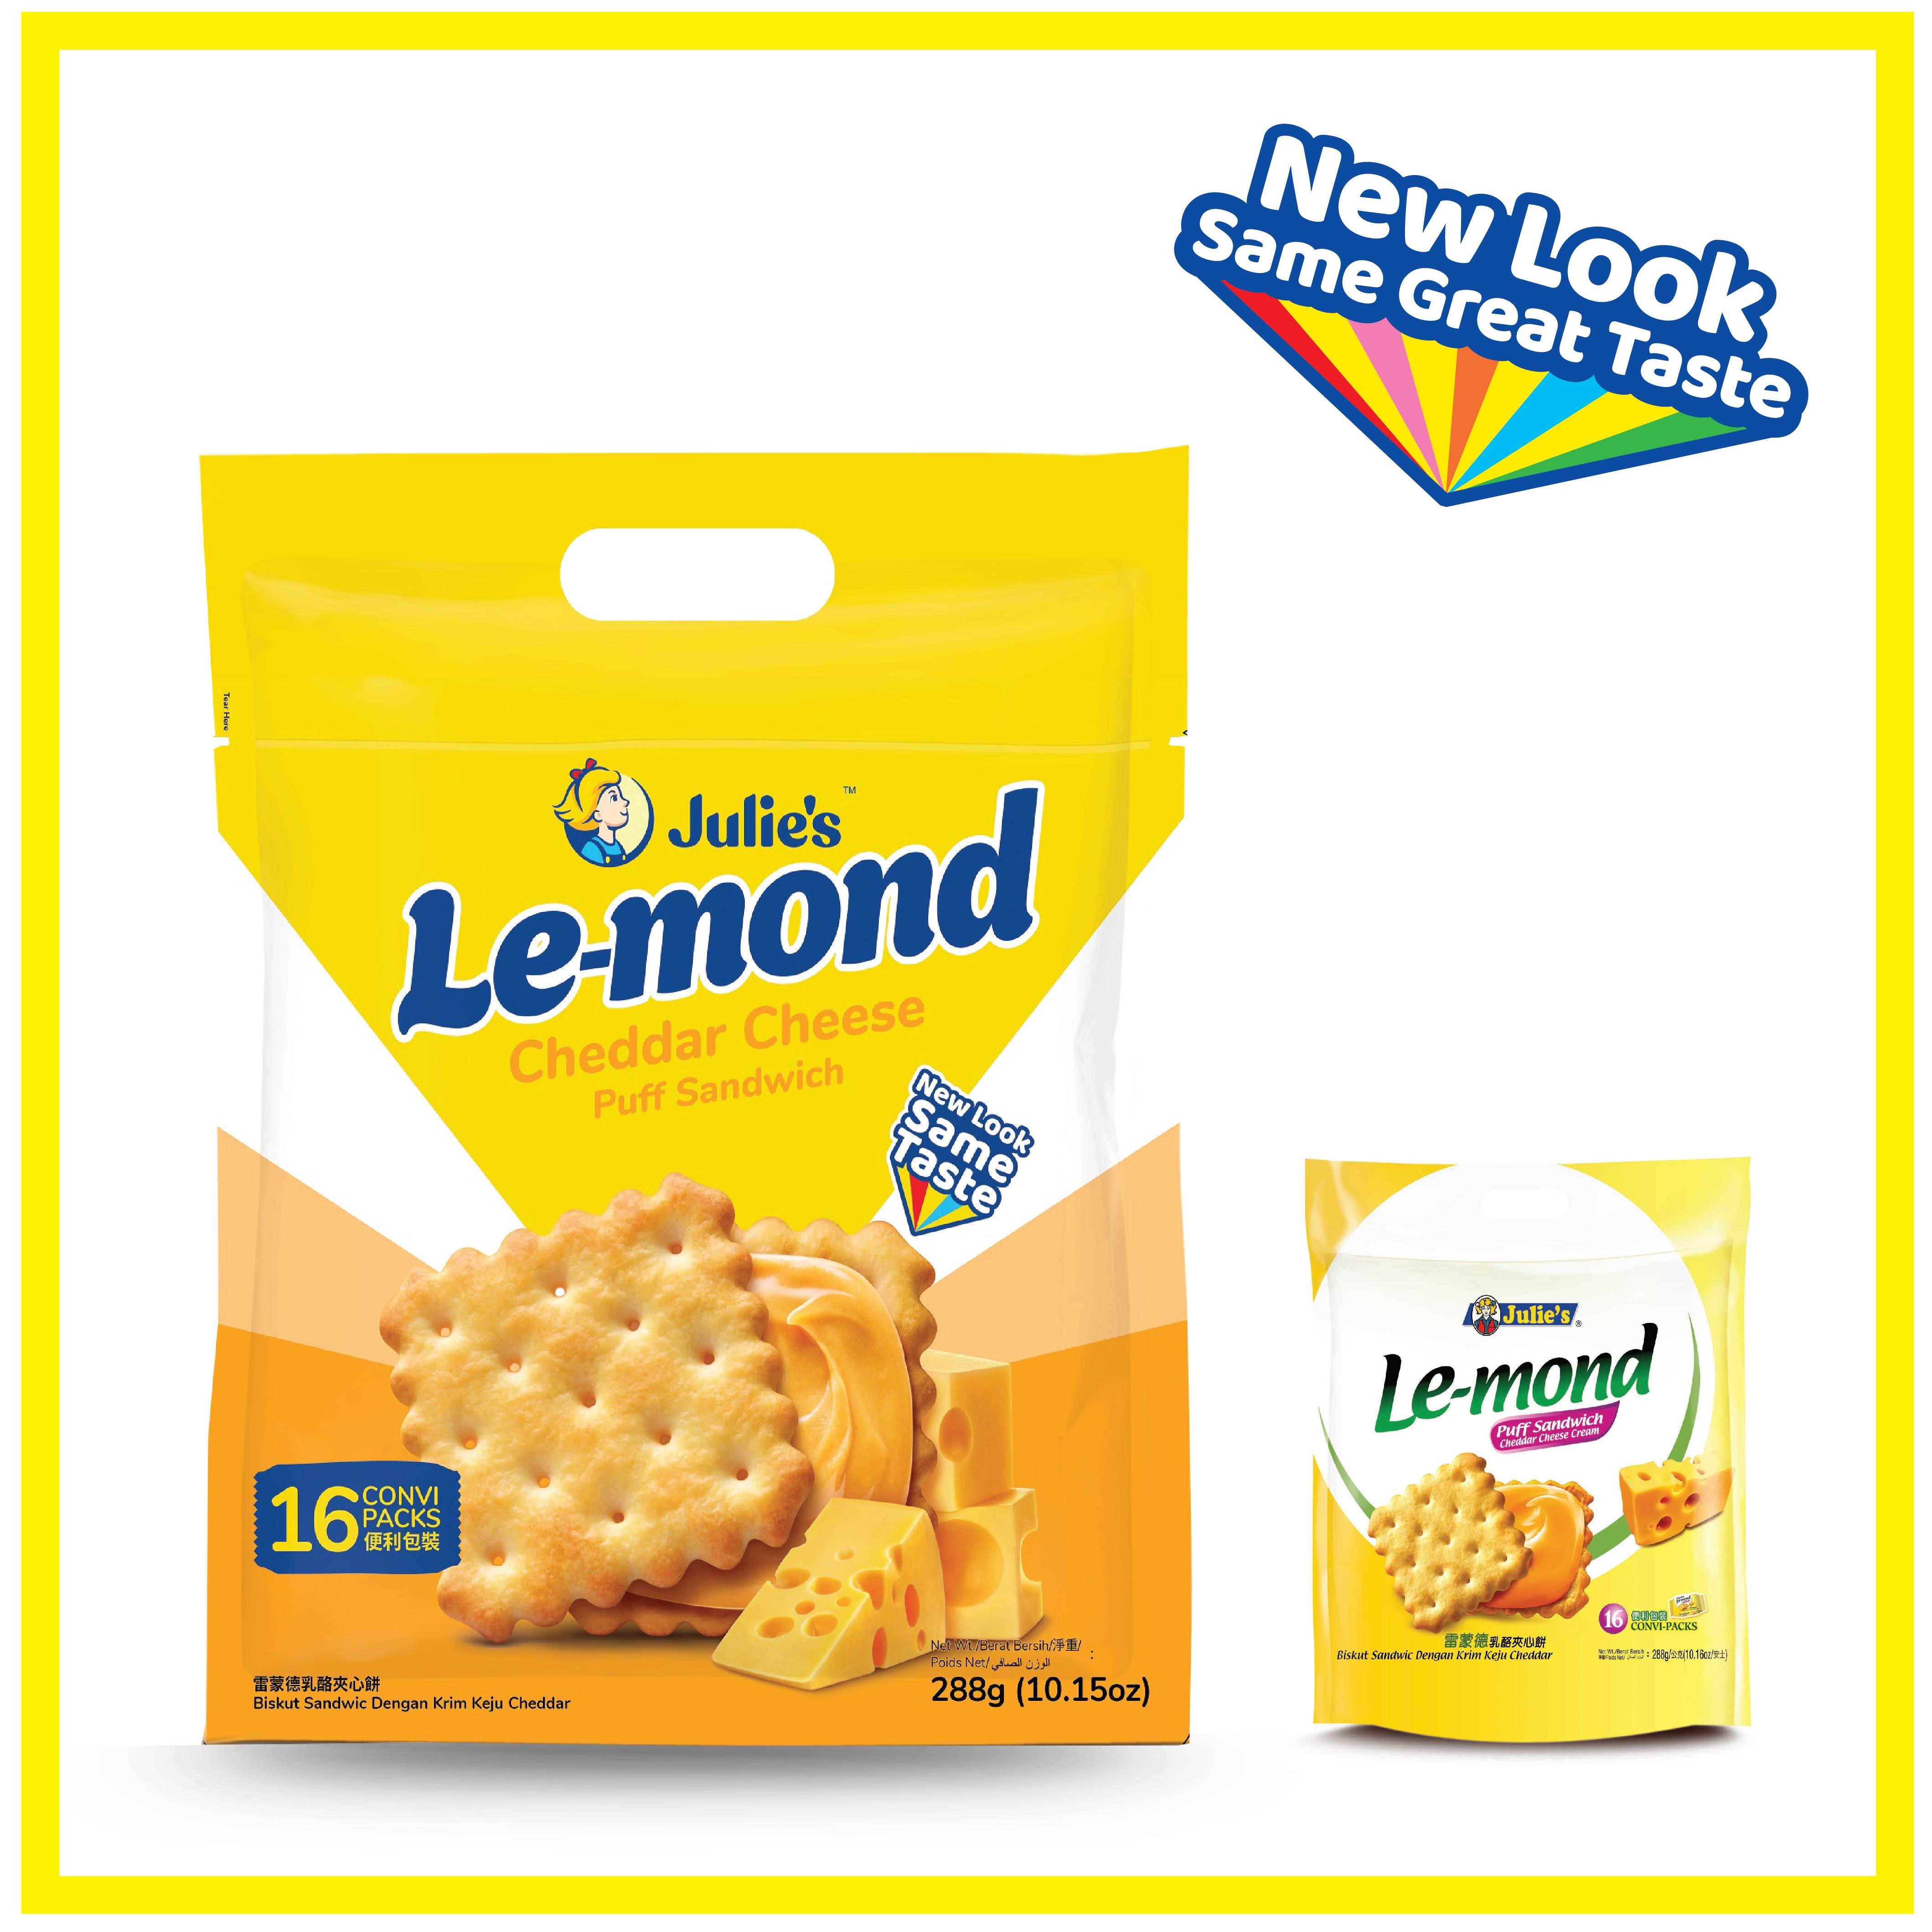 Julies Le-mond Cheddar Cheese 288g x 1 pack